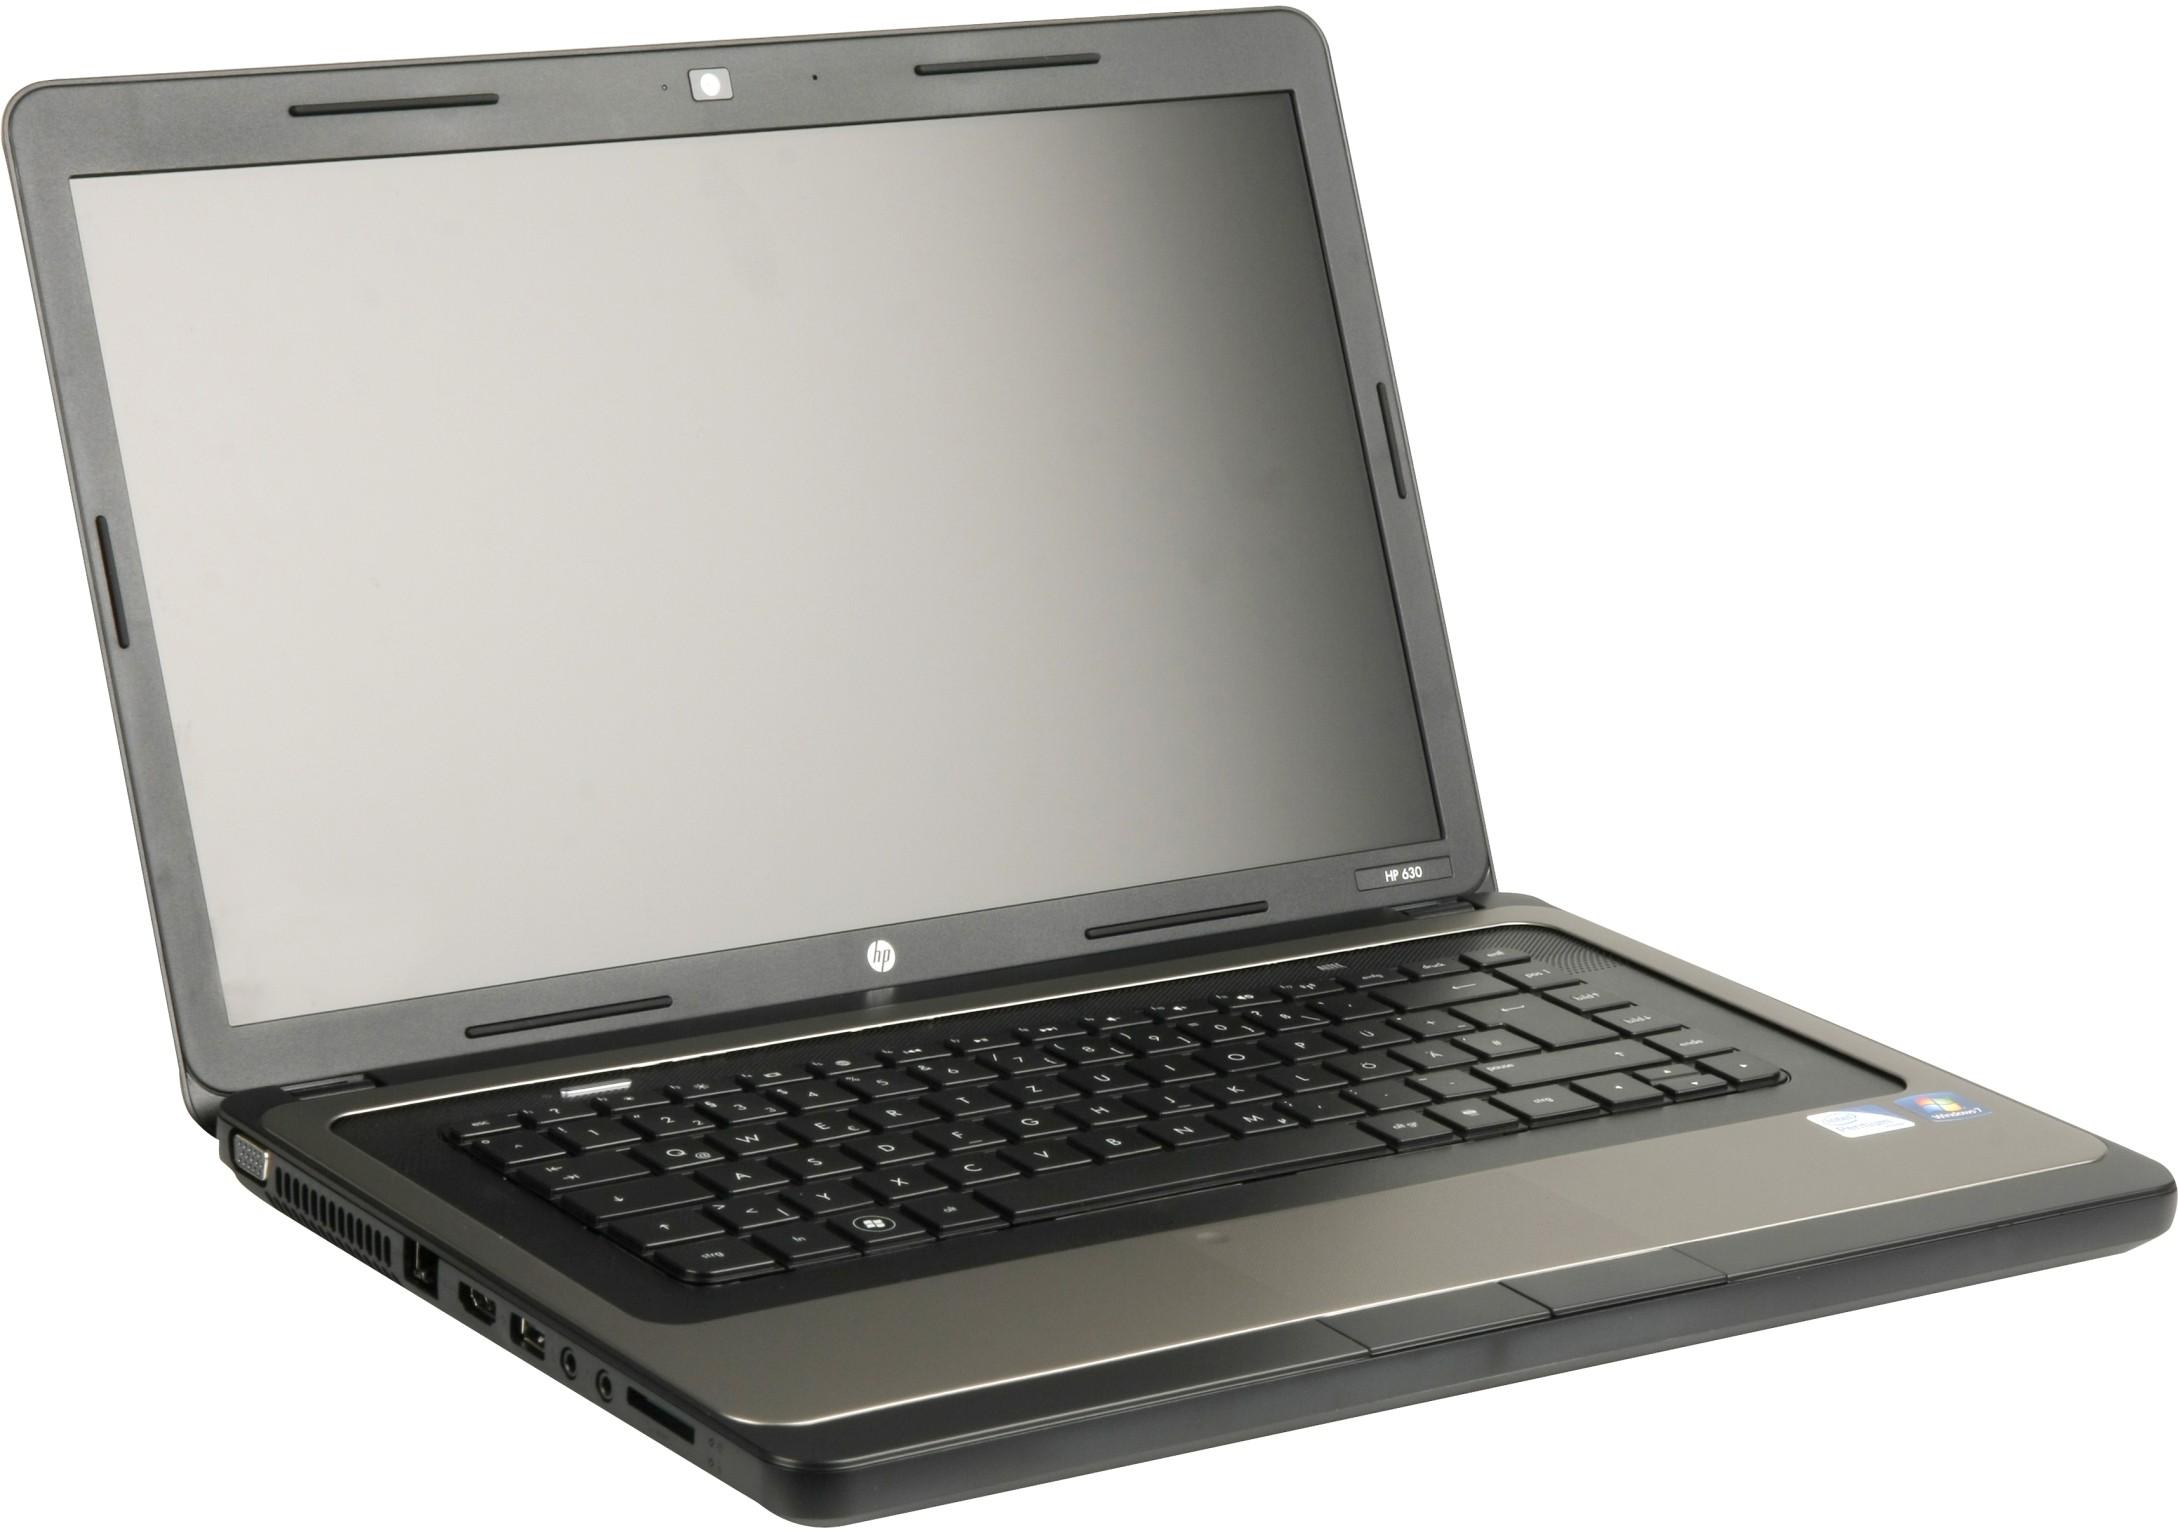 notebook hp 630 a1e25ea hdmi 15 6 zoll led windows 7 hp laptop neu. Black Bedroom Furniture Sets. Home Design Ideas